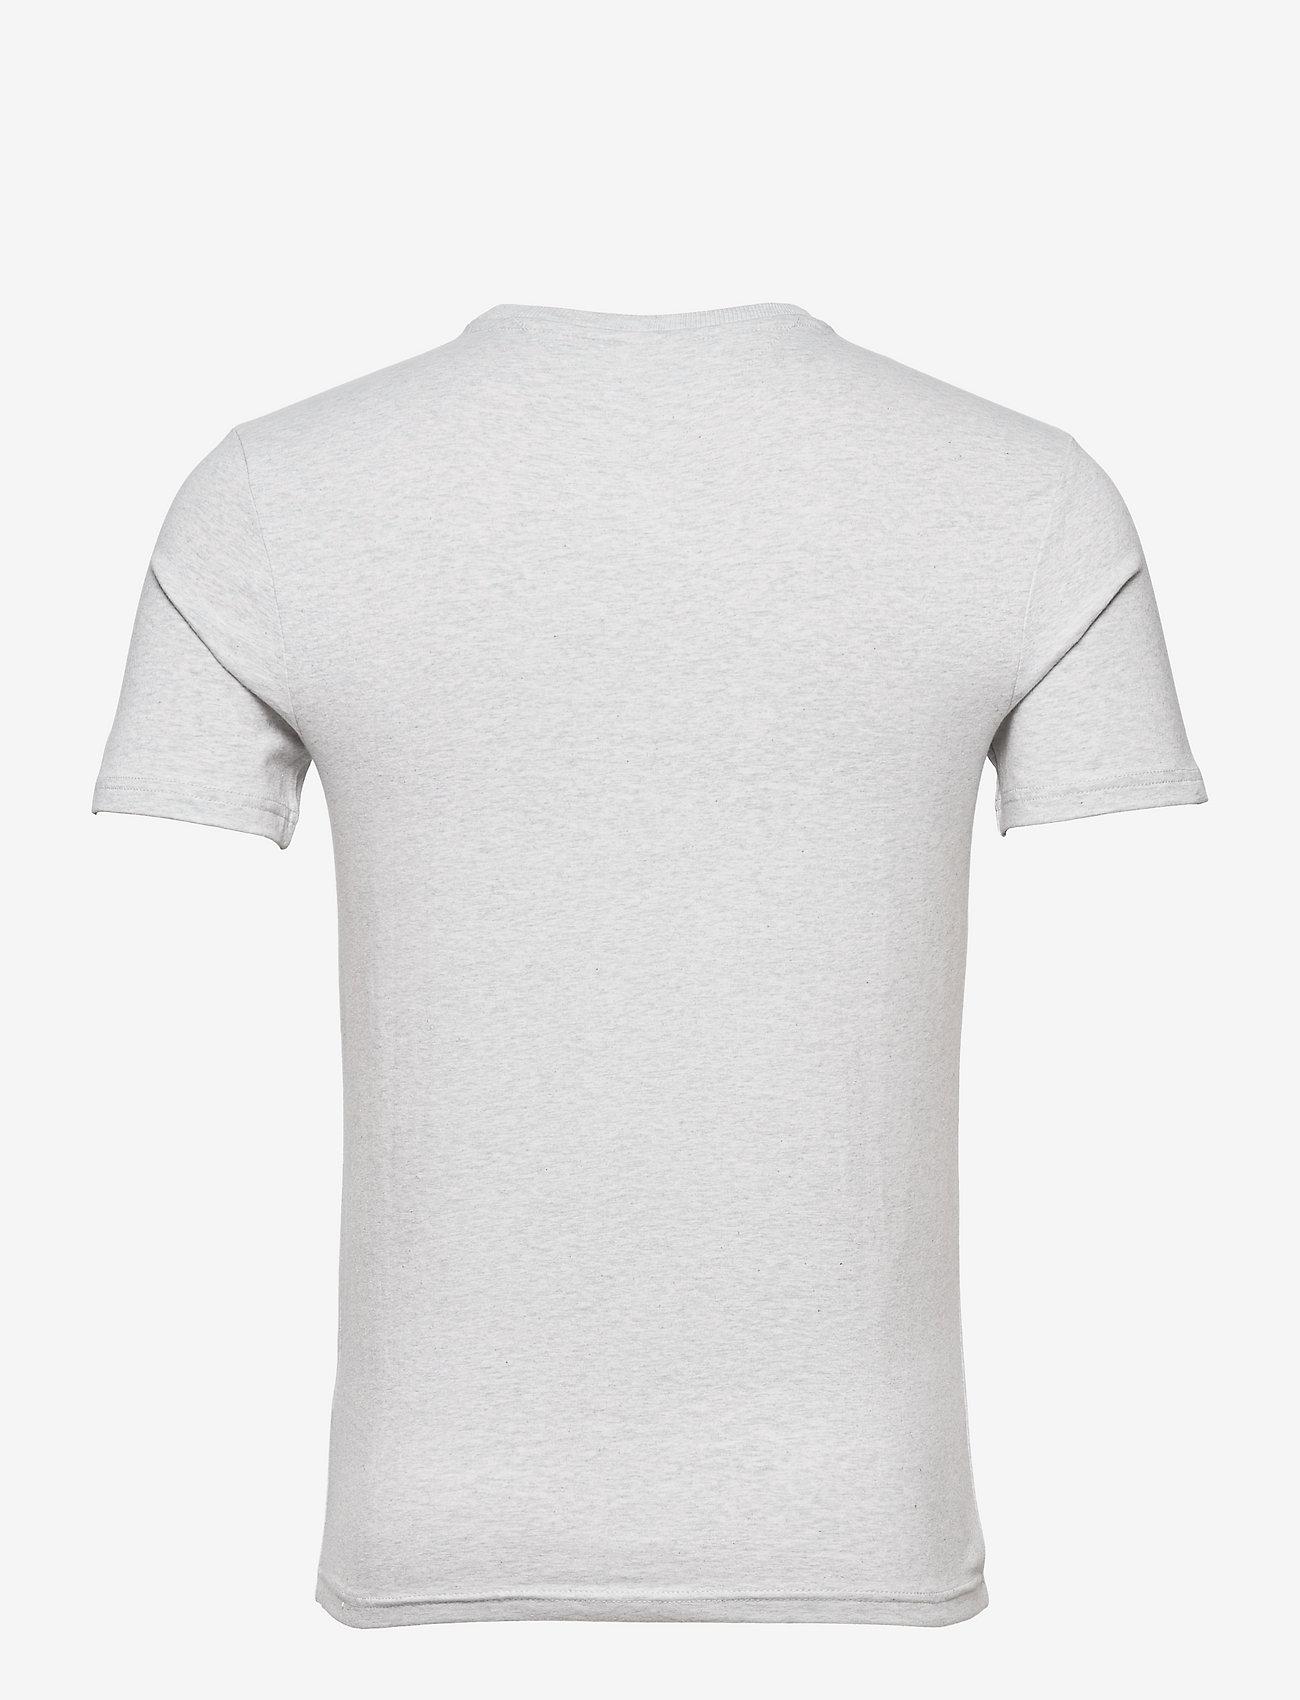 Tommy Jeans - TJM SCRIPT BOX LOGO TEE - kortärmade t-shirts - silver grey htr - 1